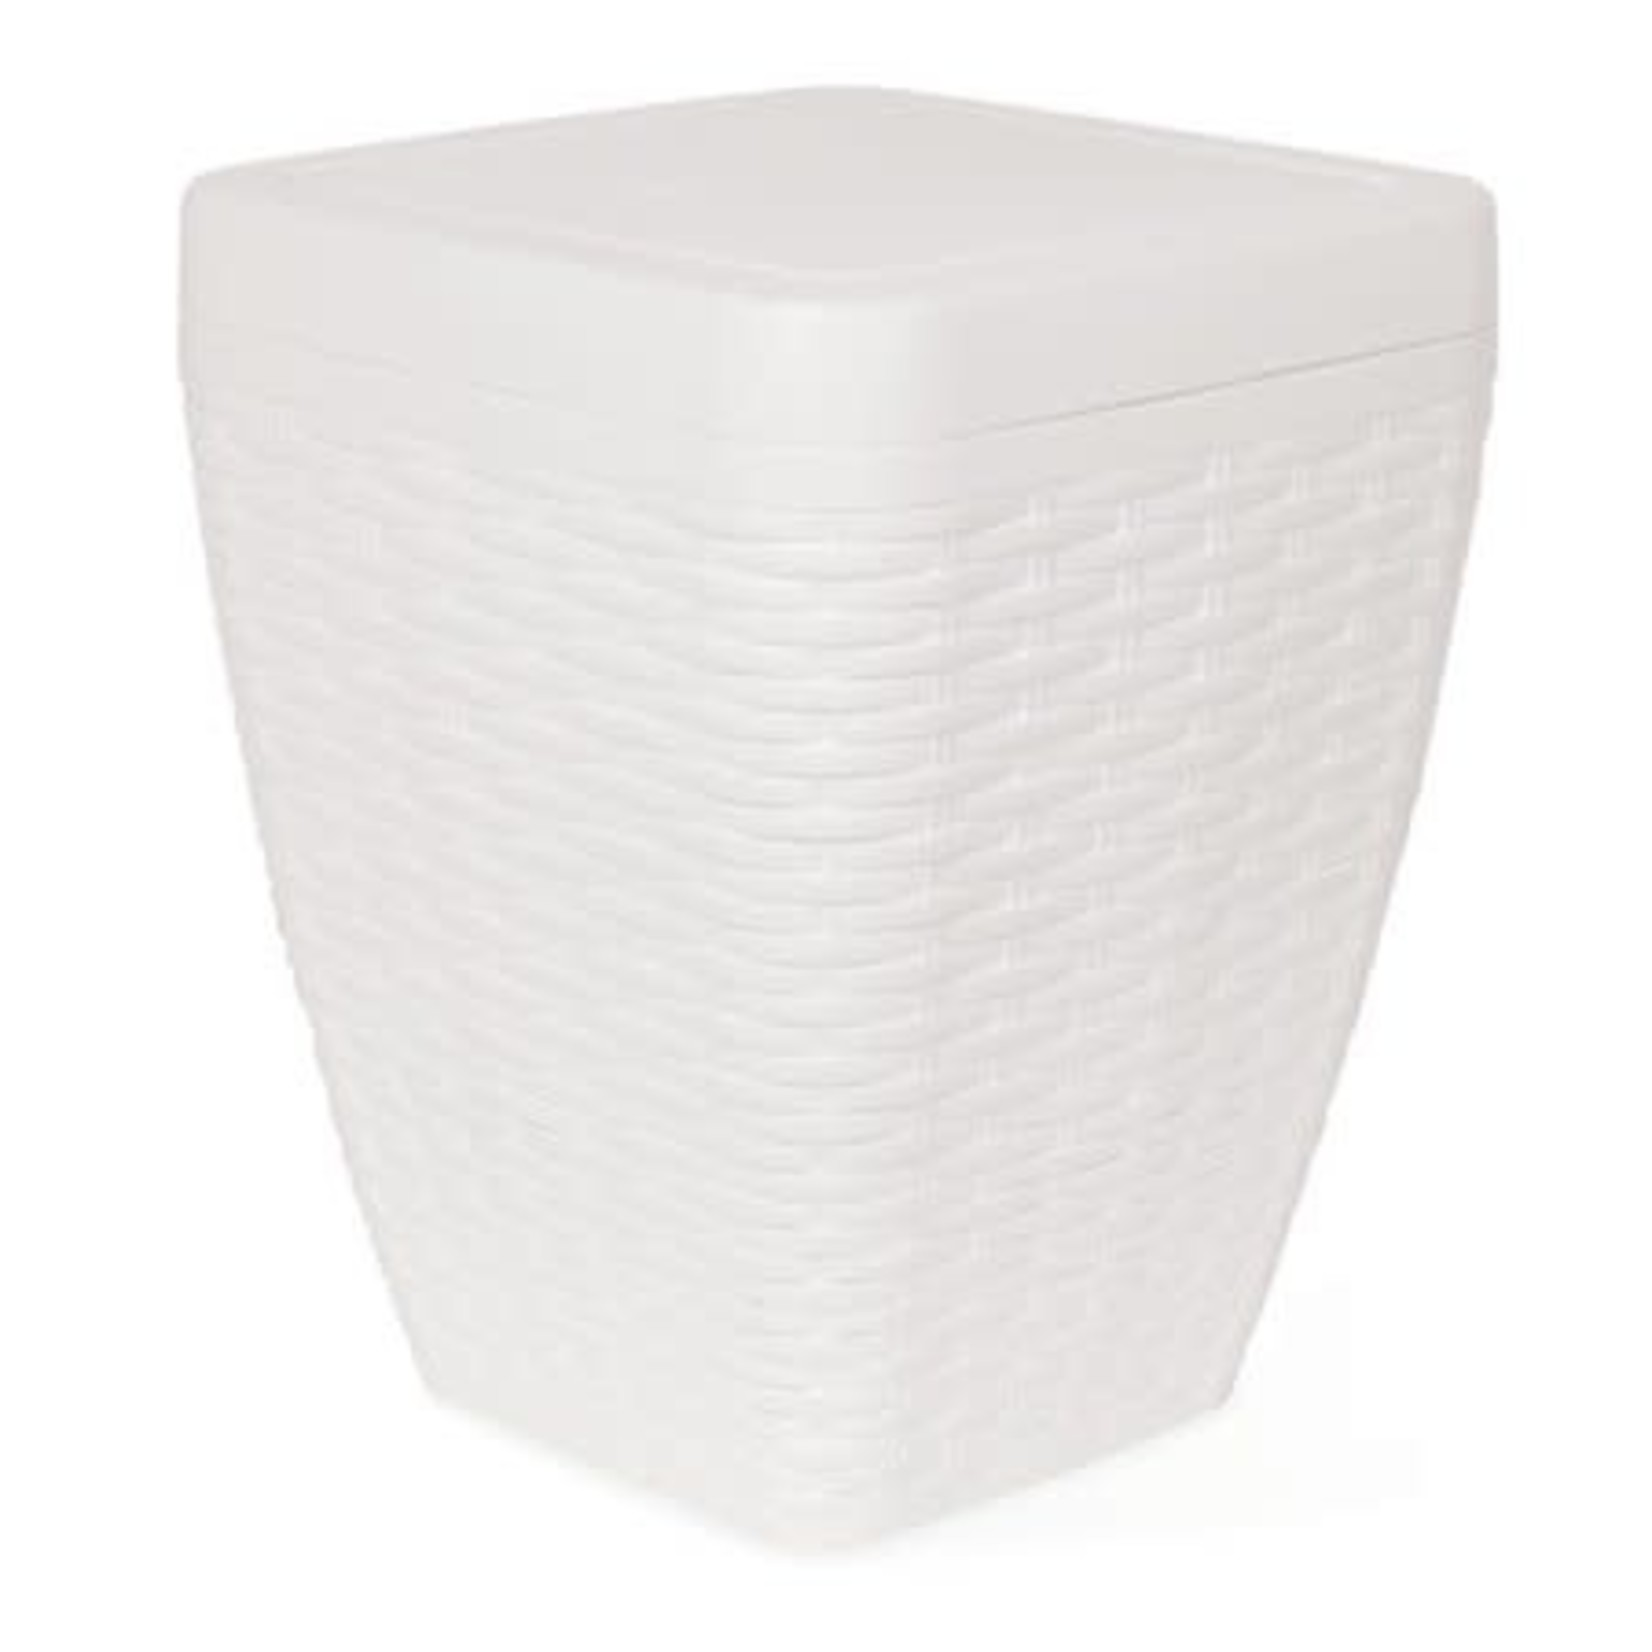 6.5 qt Deluxe Wicker Square Swing Trash Can, White